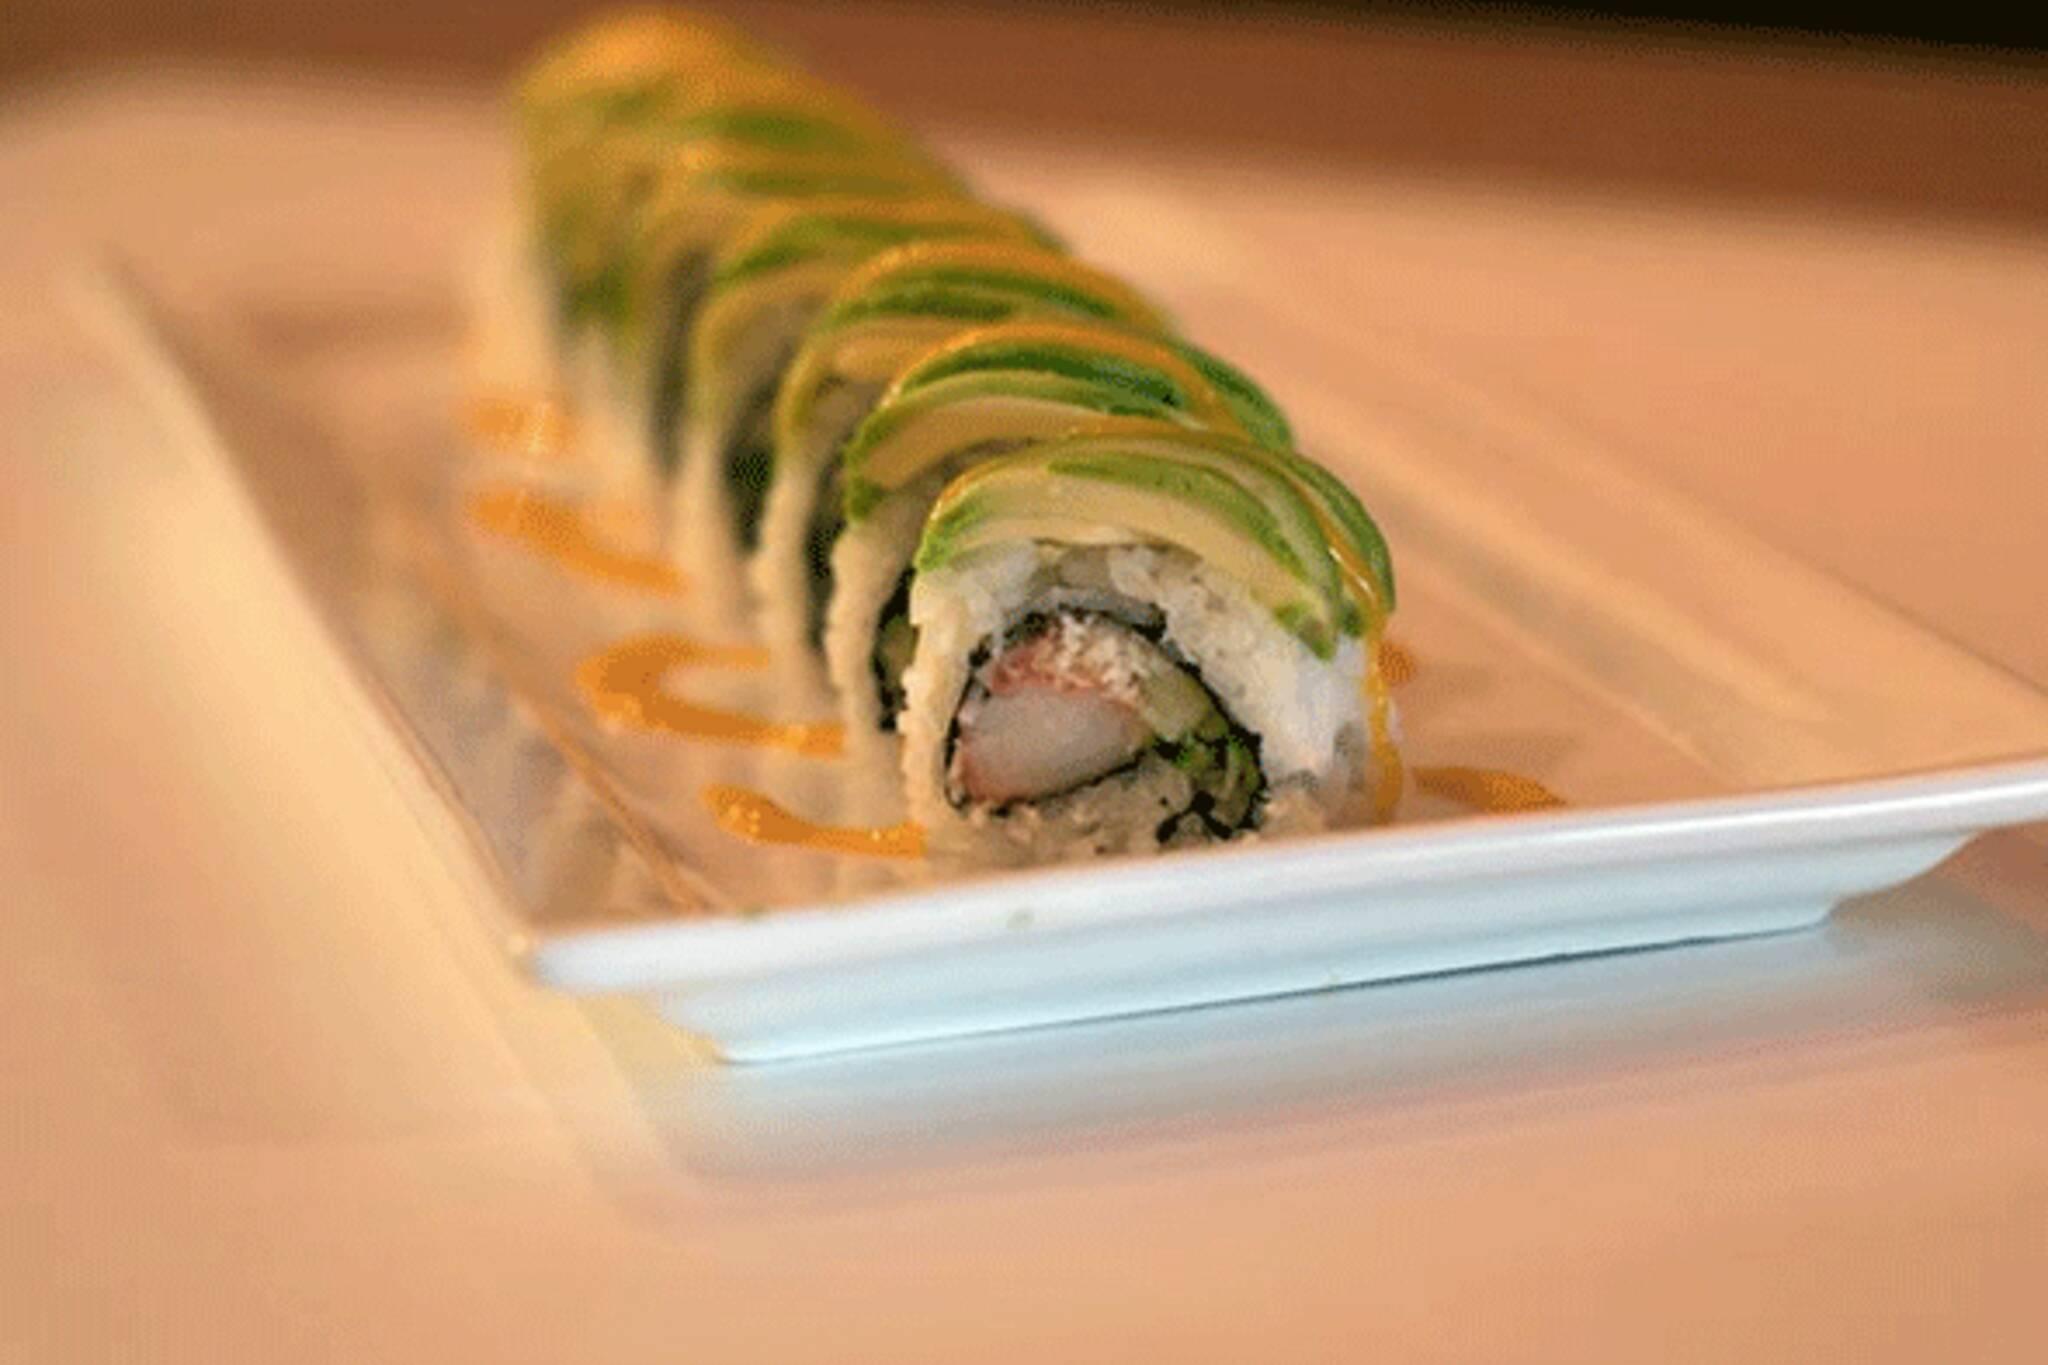 matsuda japanese cuisine toronto